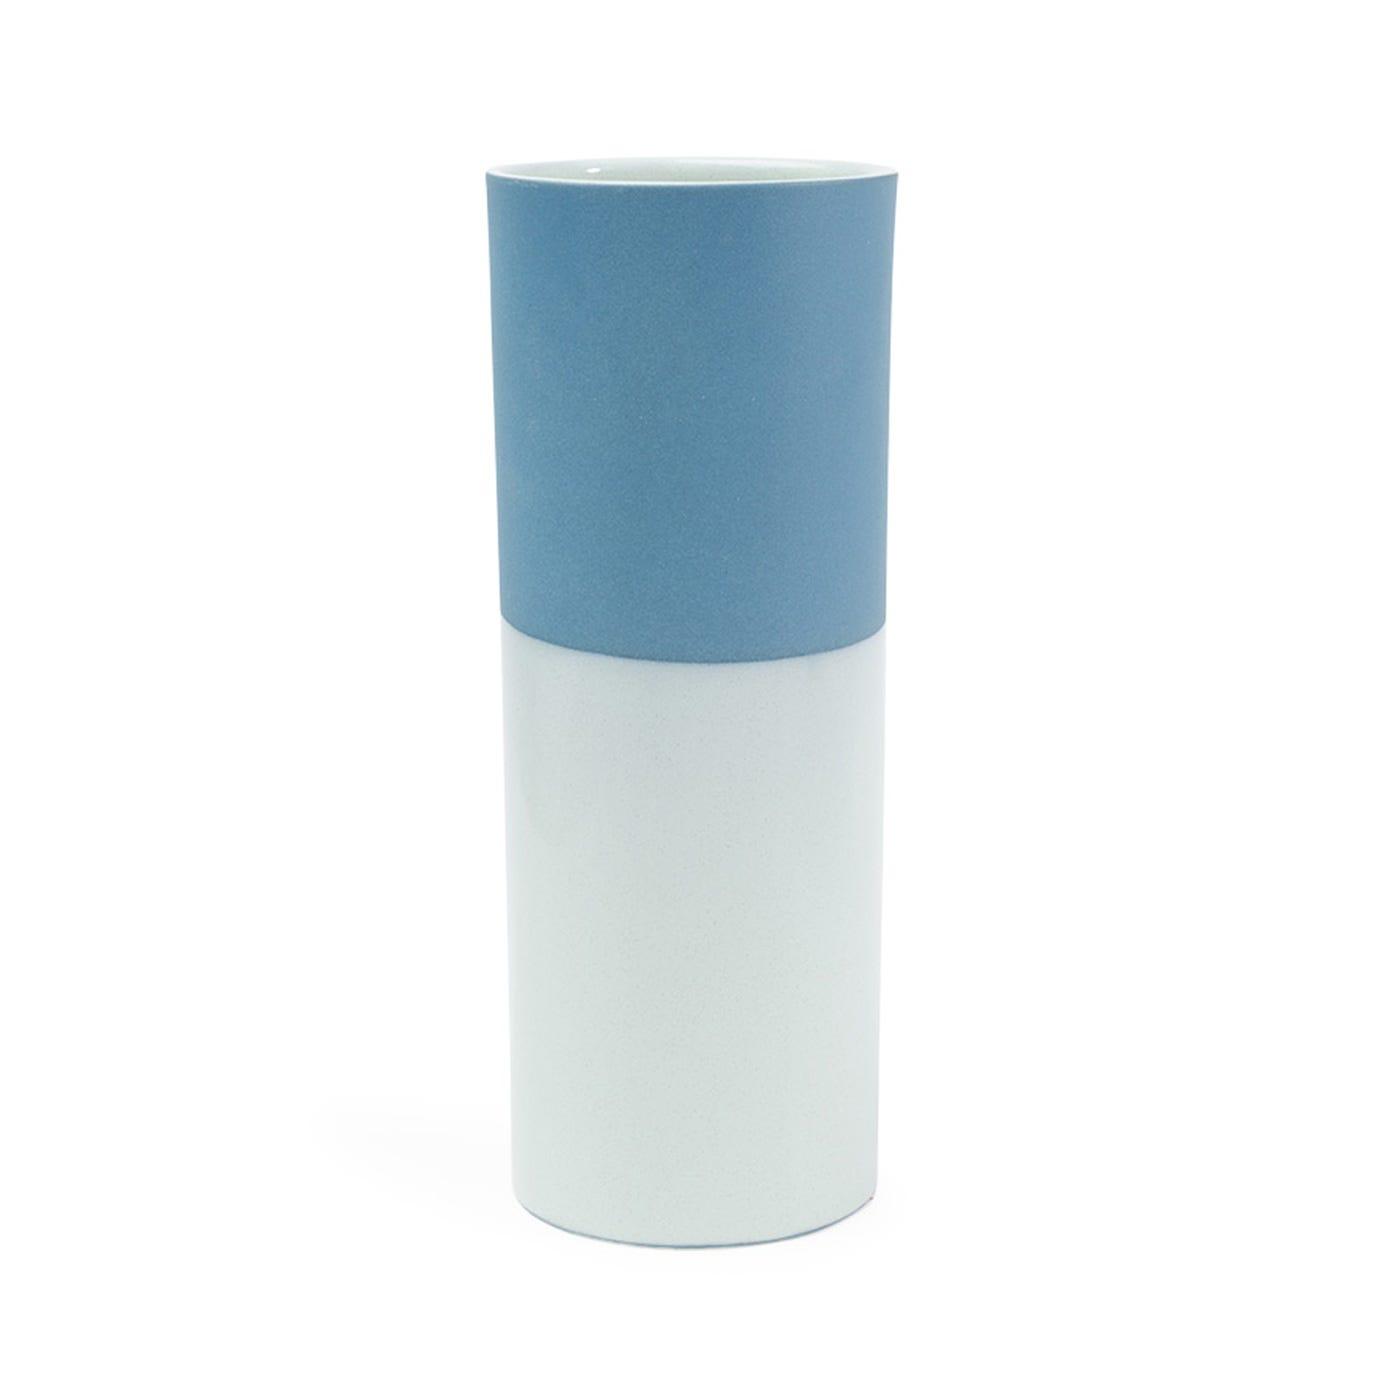 Dual Tone Vase Mint & Blue